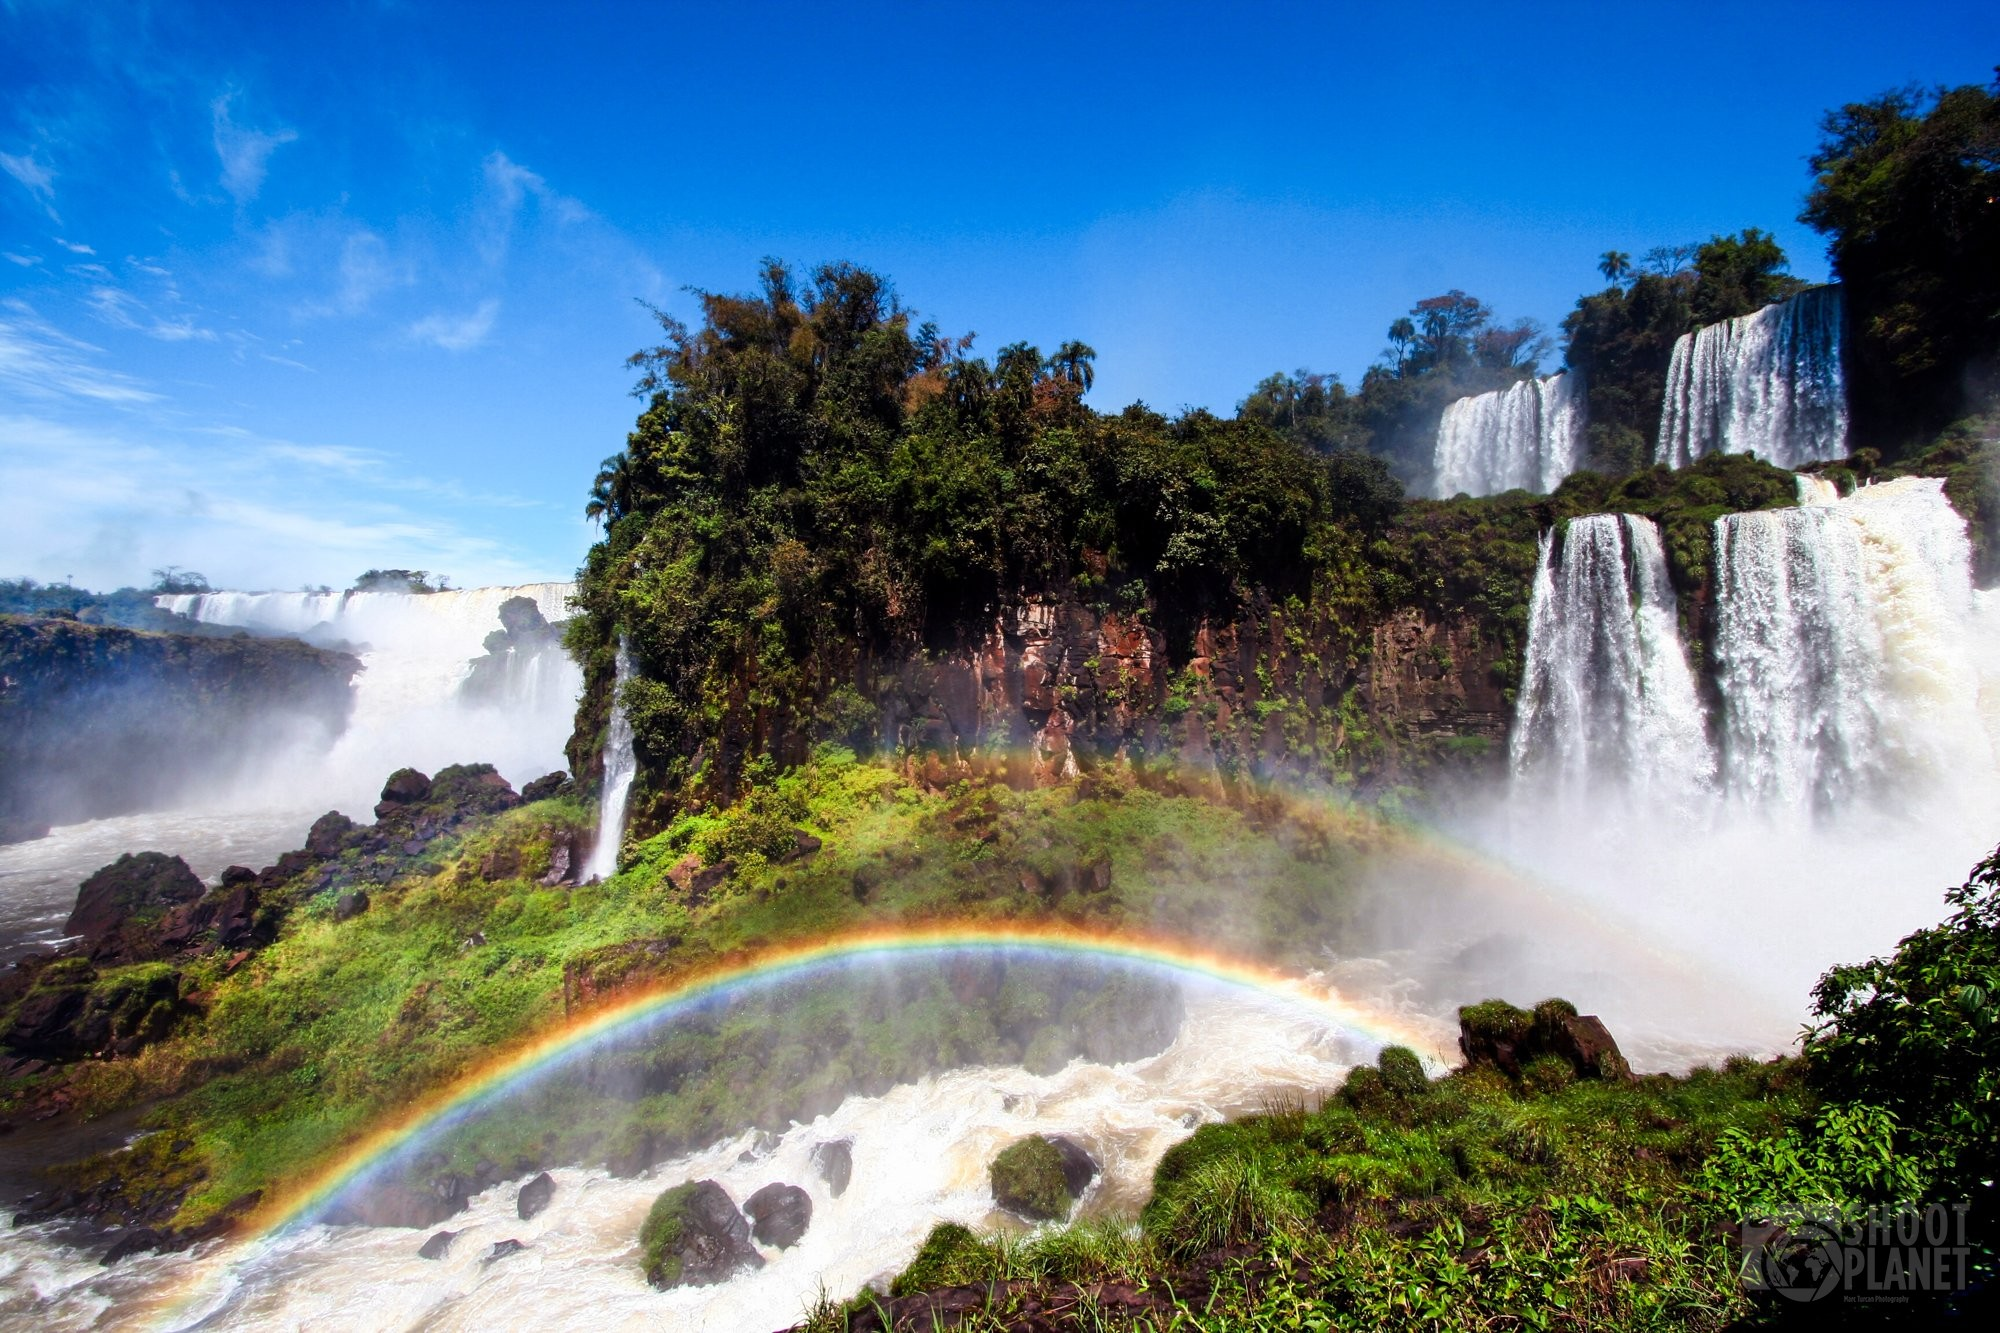 Iguazu Falls cataracts and double rainbow